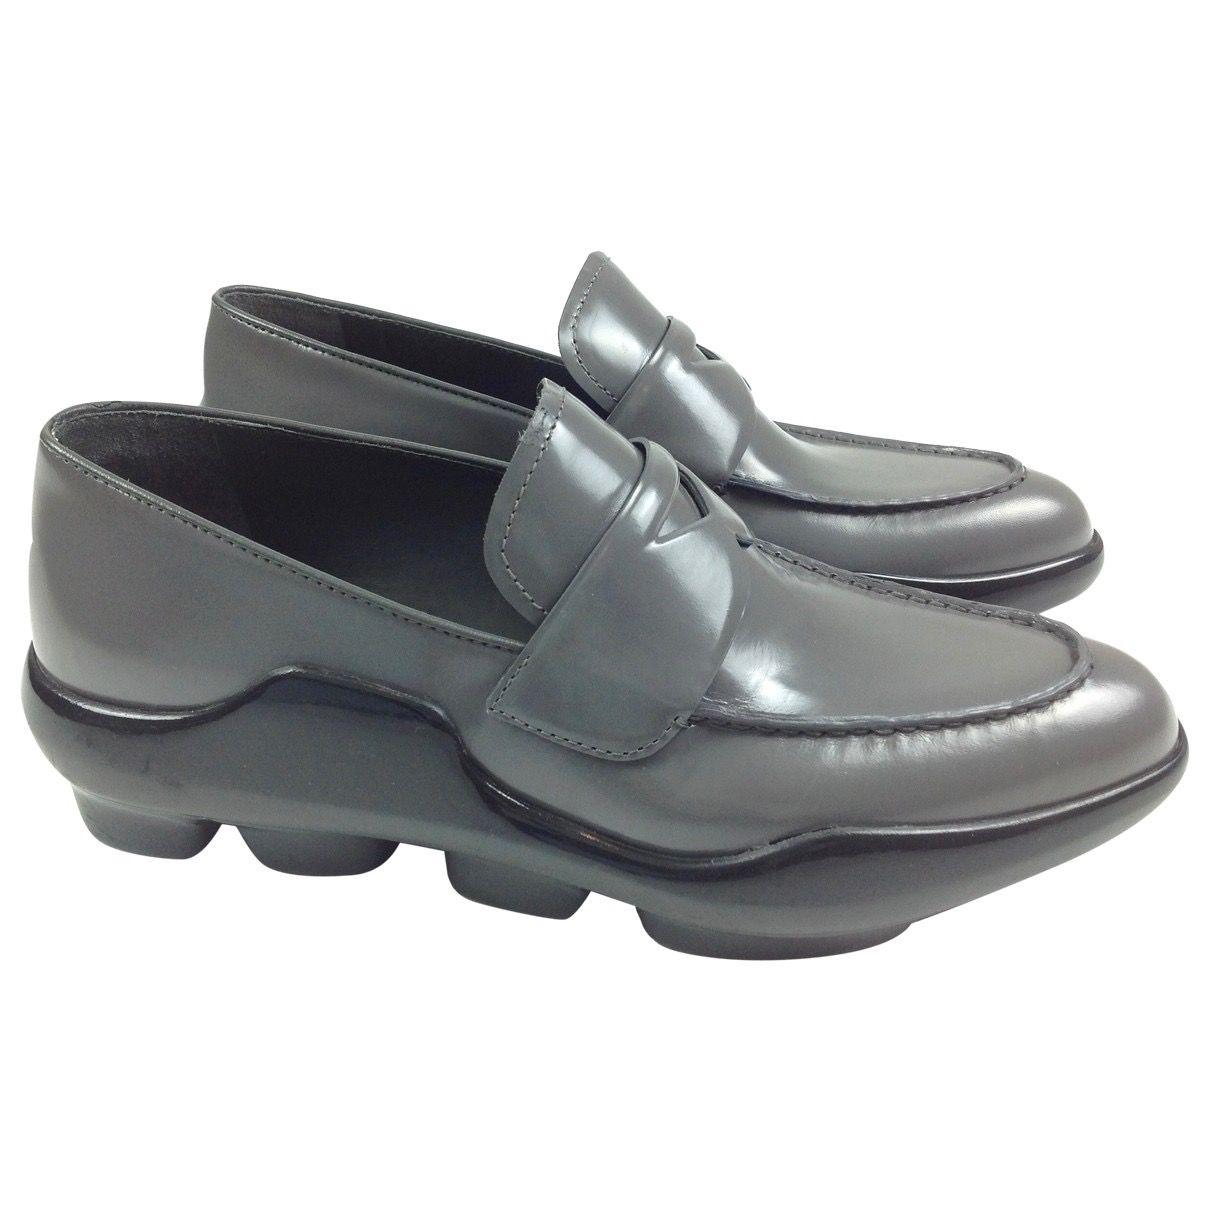 02f8ffc94f9be Grey loafers